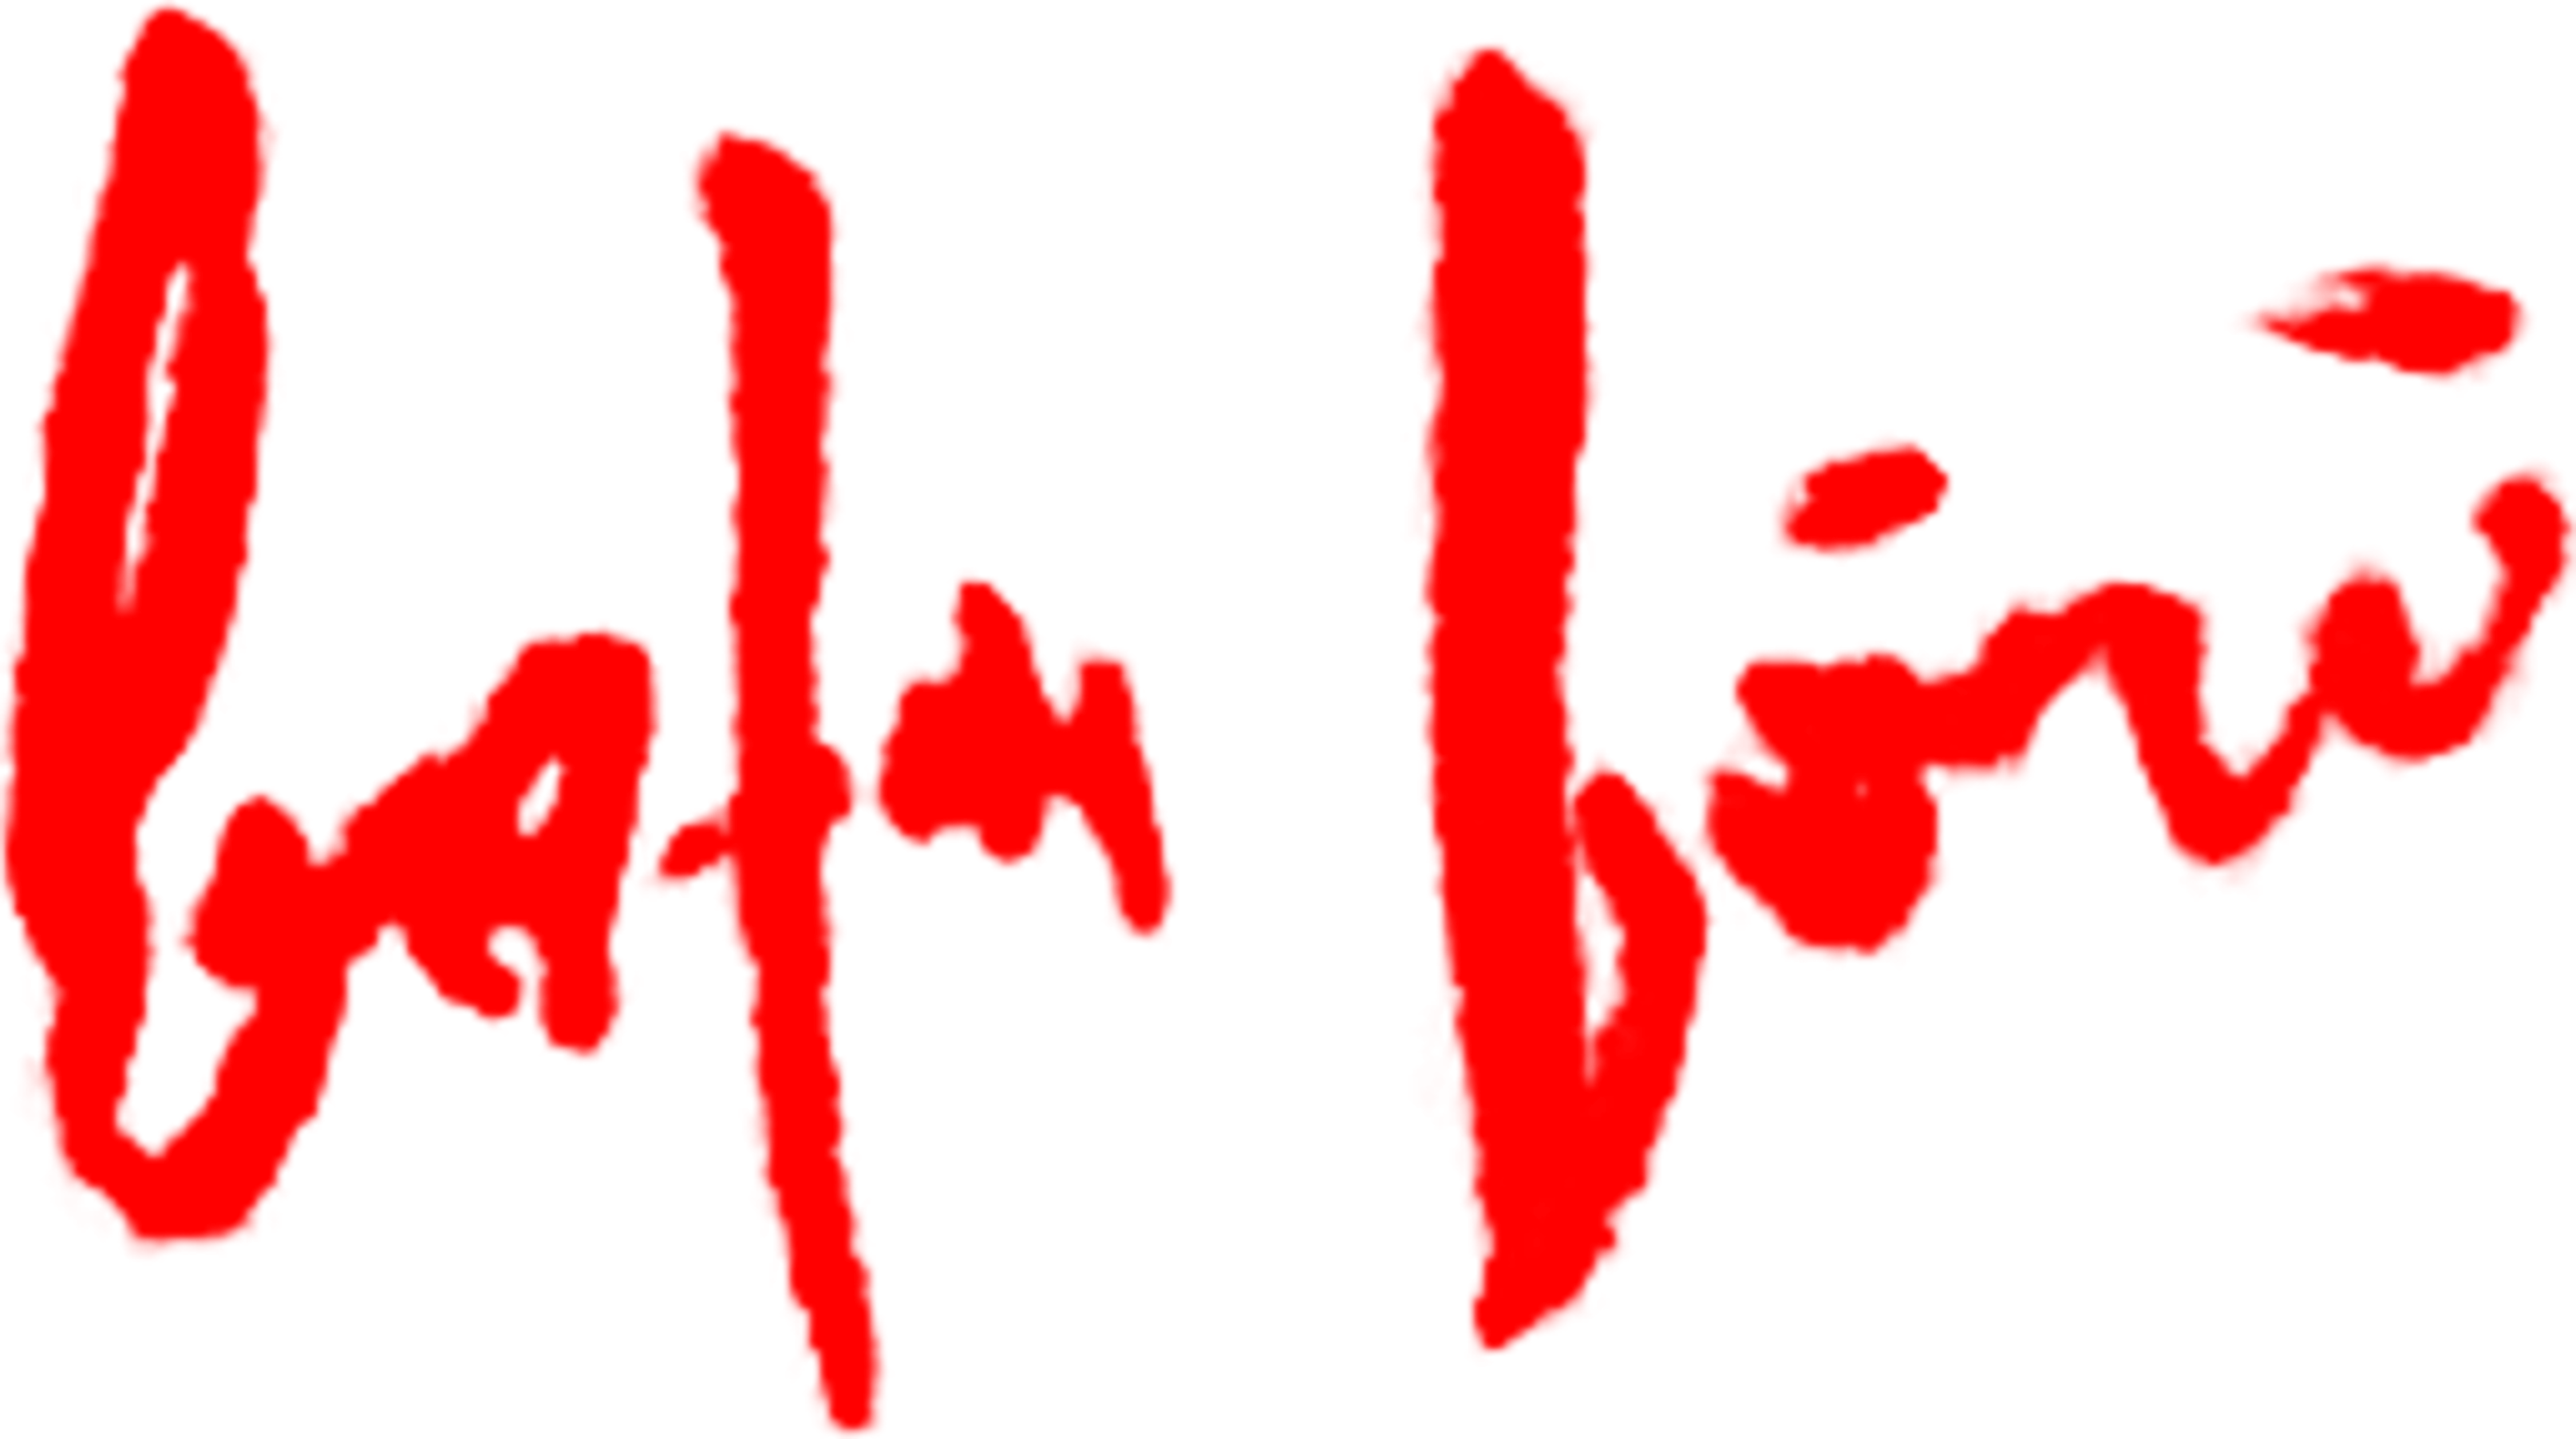 baha boru's Signature